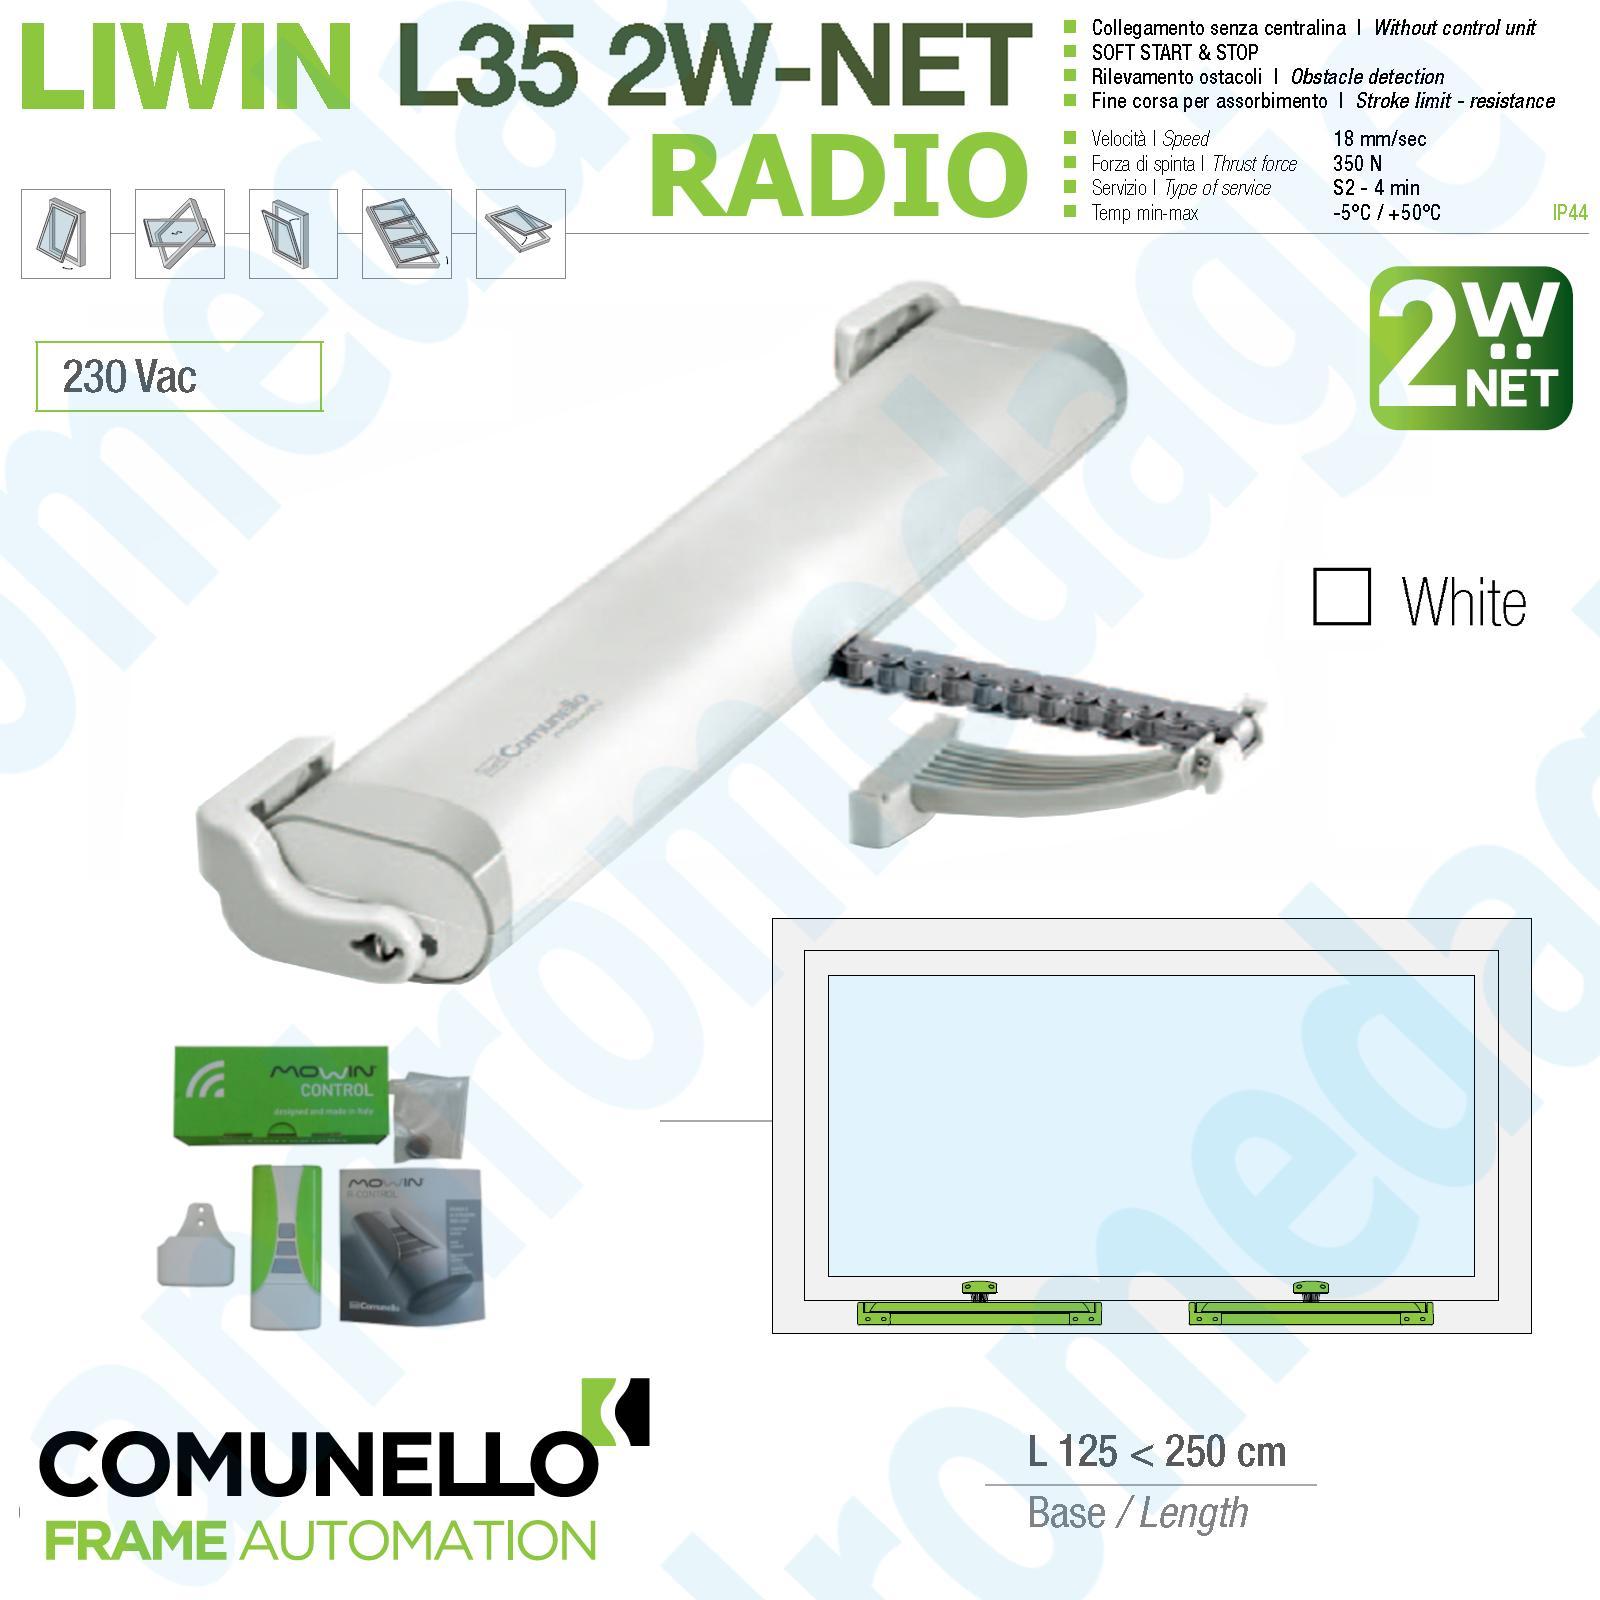 LIWIN 2W-NET RADIO 350N 230V BIANCO + R1 CONTROL VERDE + STAFFE ABBAINO